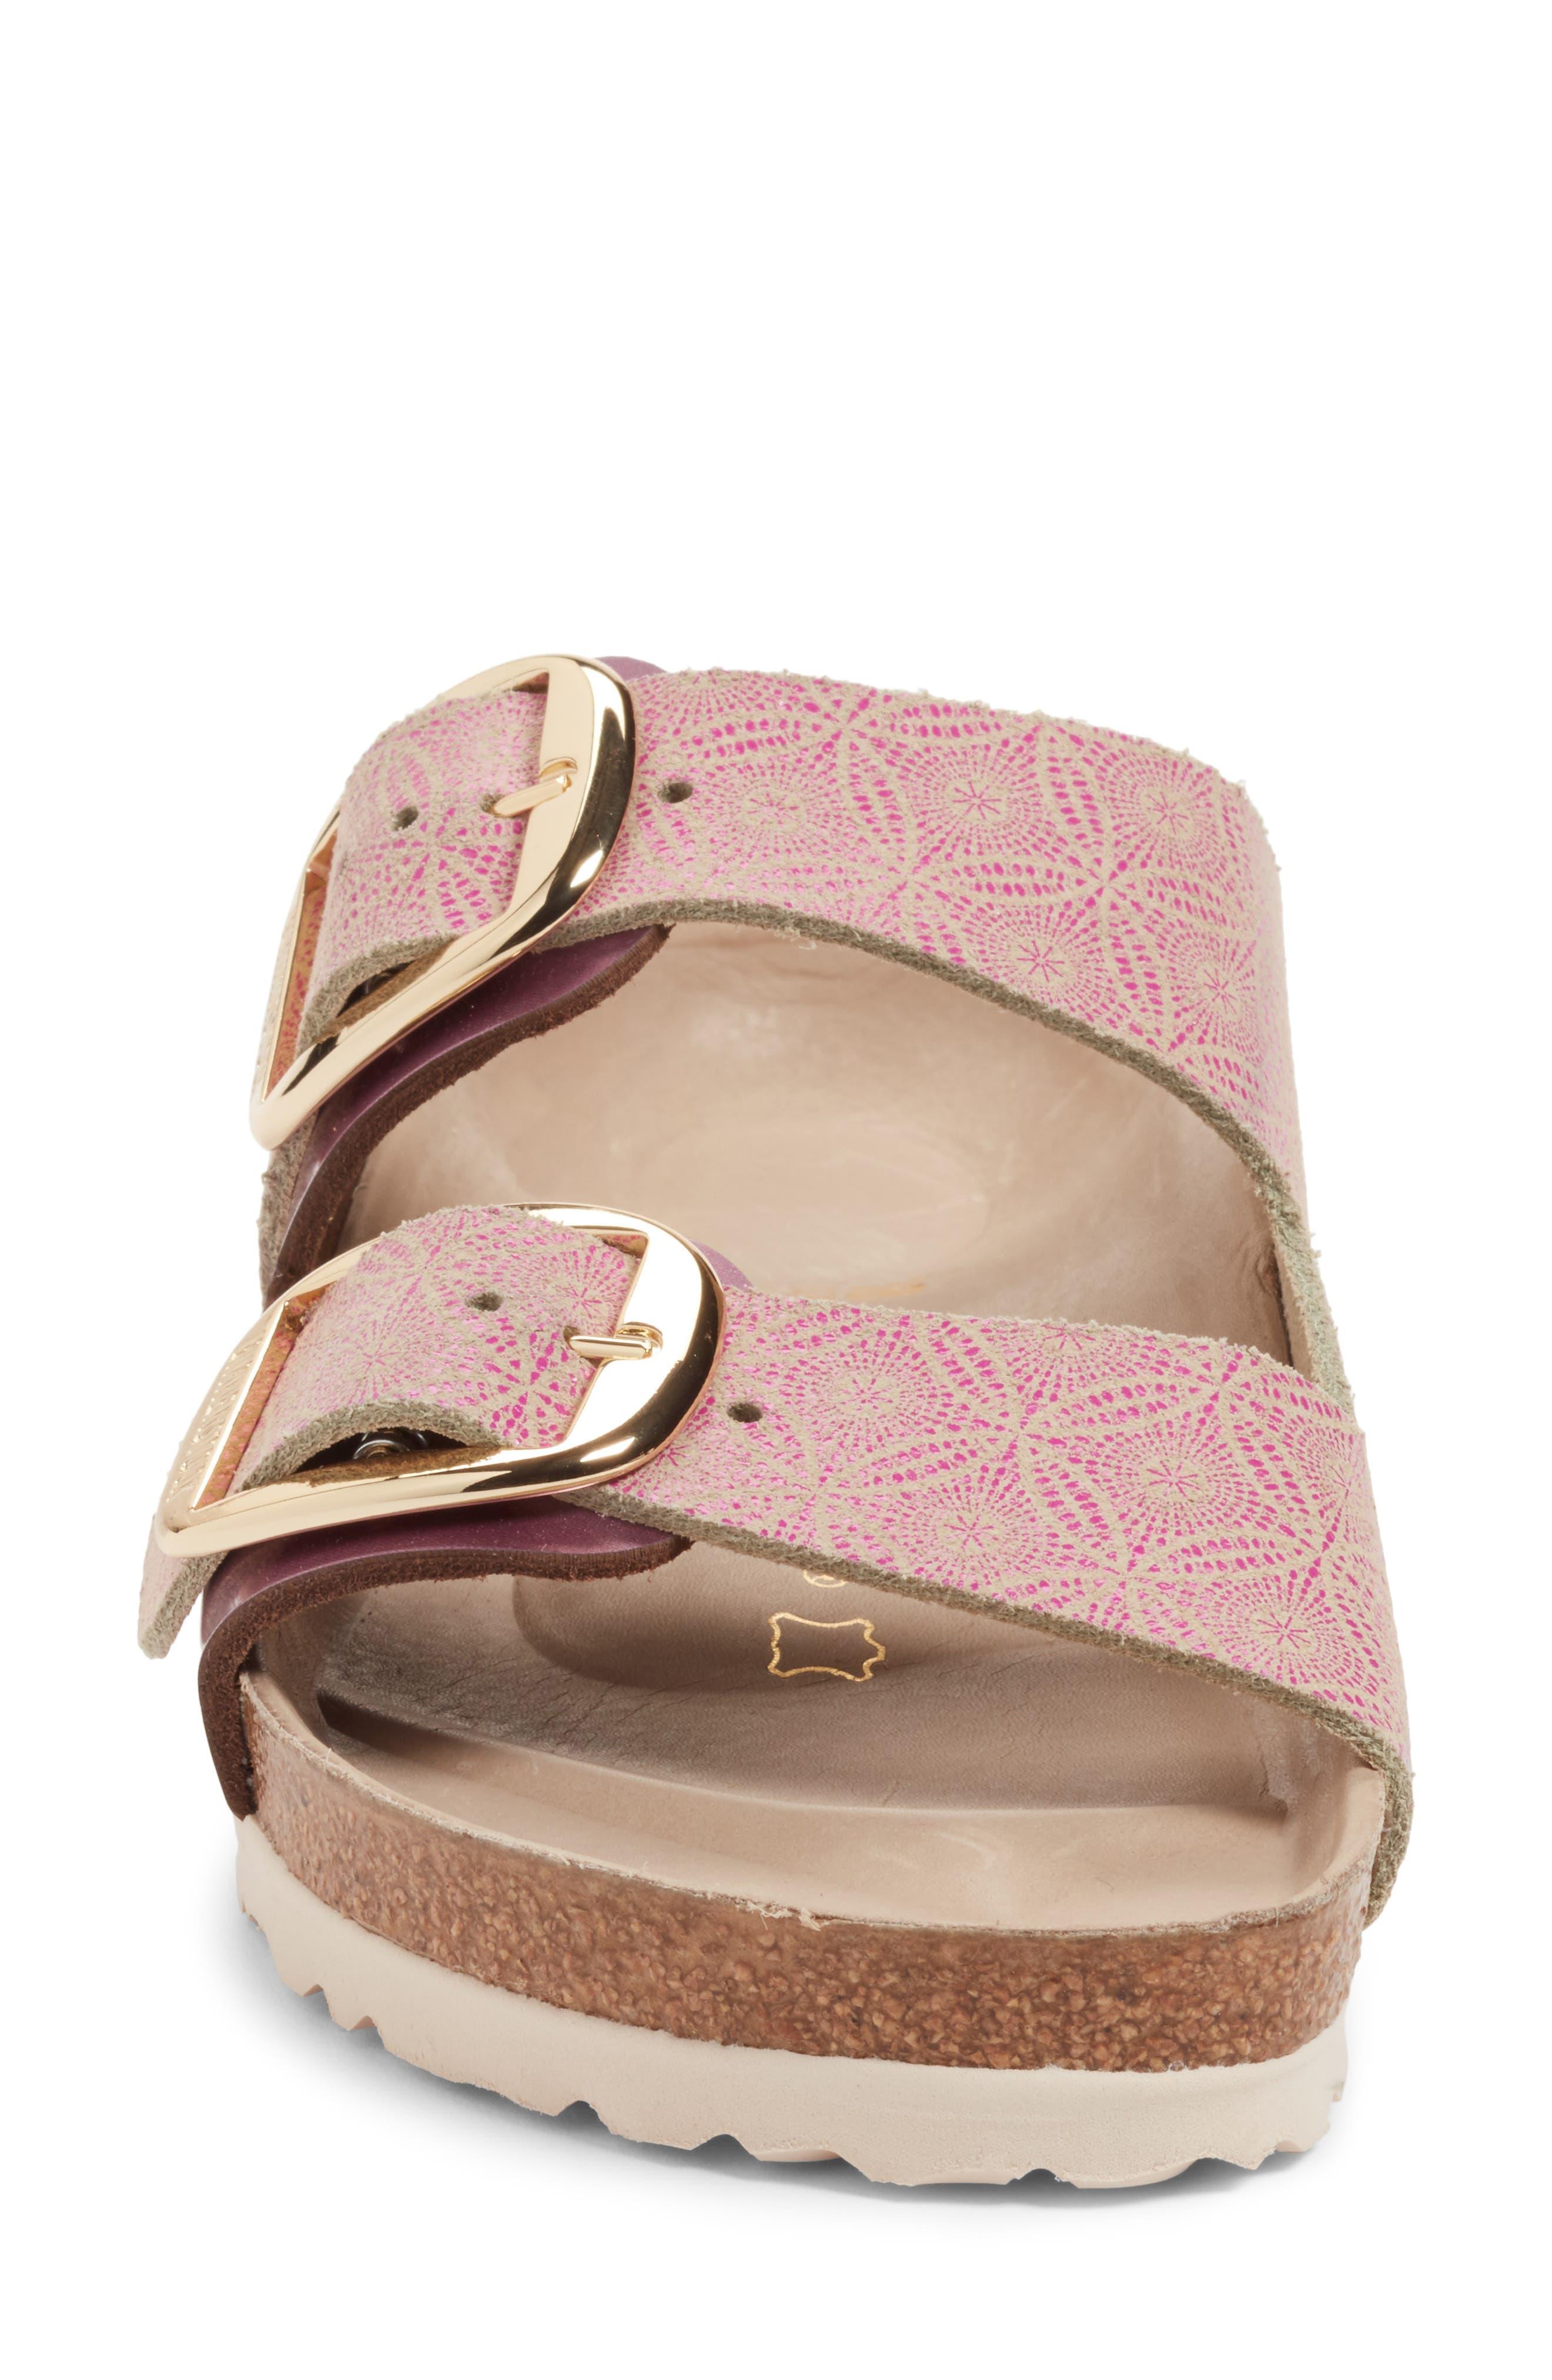 Arizona Big Buckle Slide Sandal,                             Alternate thumbnail 4, color,                             Ceramic Rose Leather